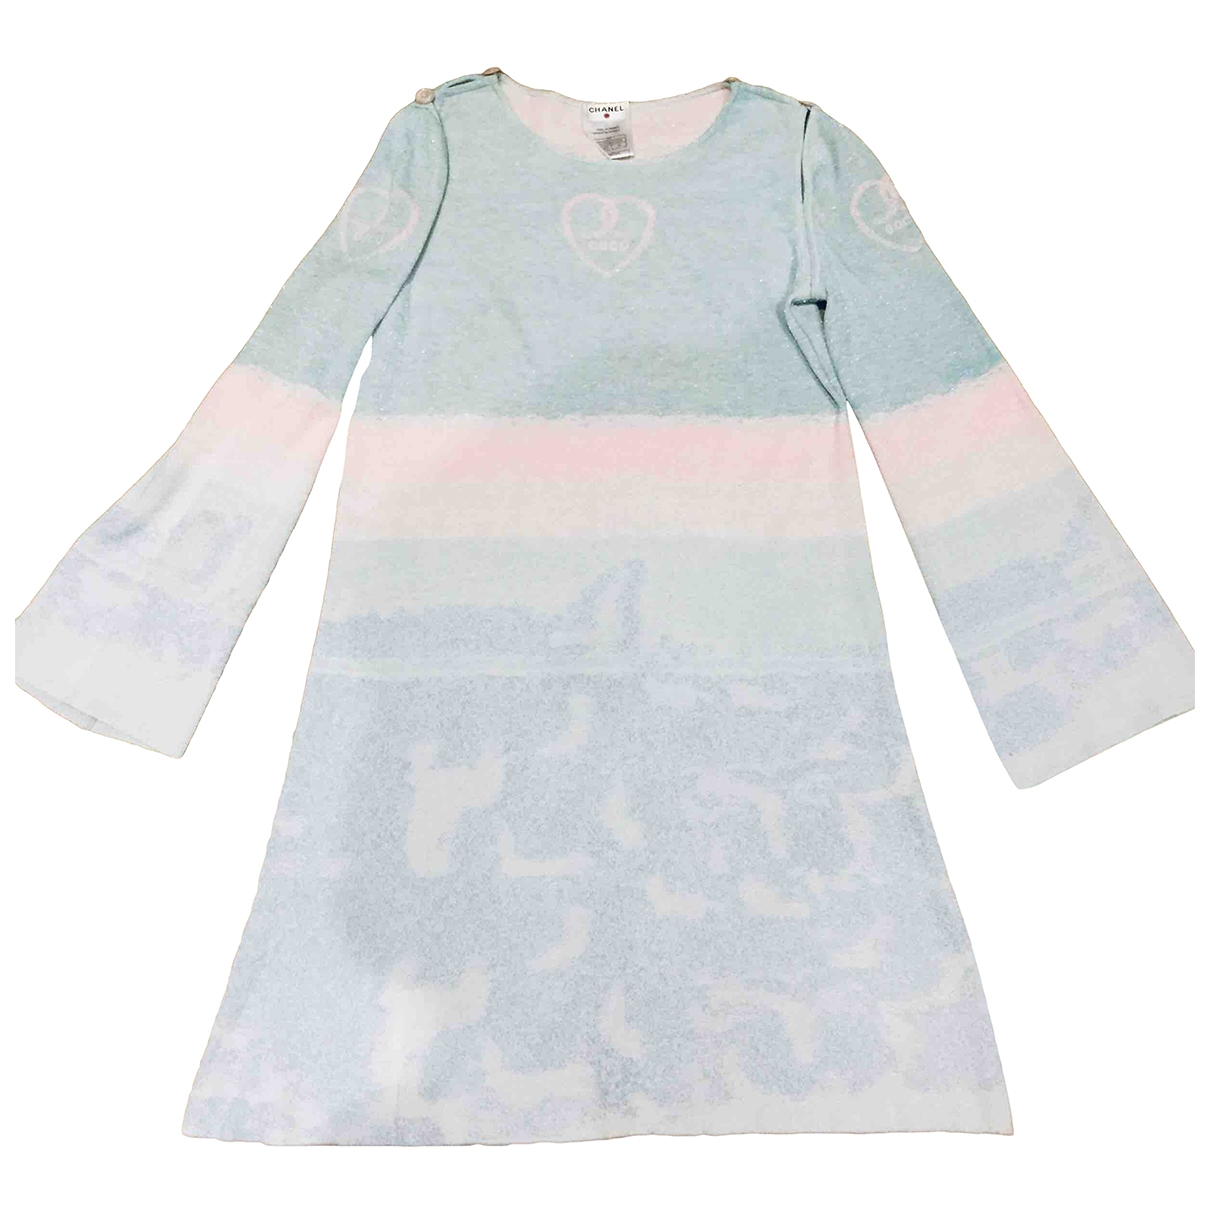 Chanel - Robe   pour femme - multicolore